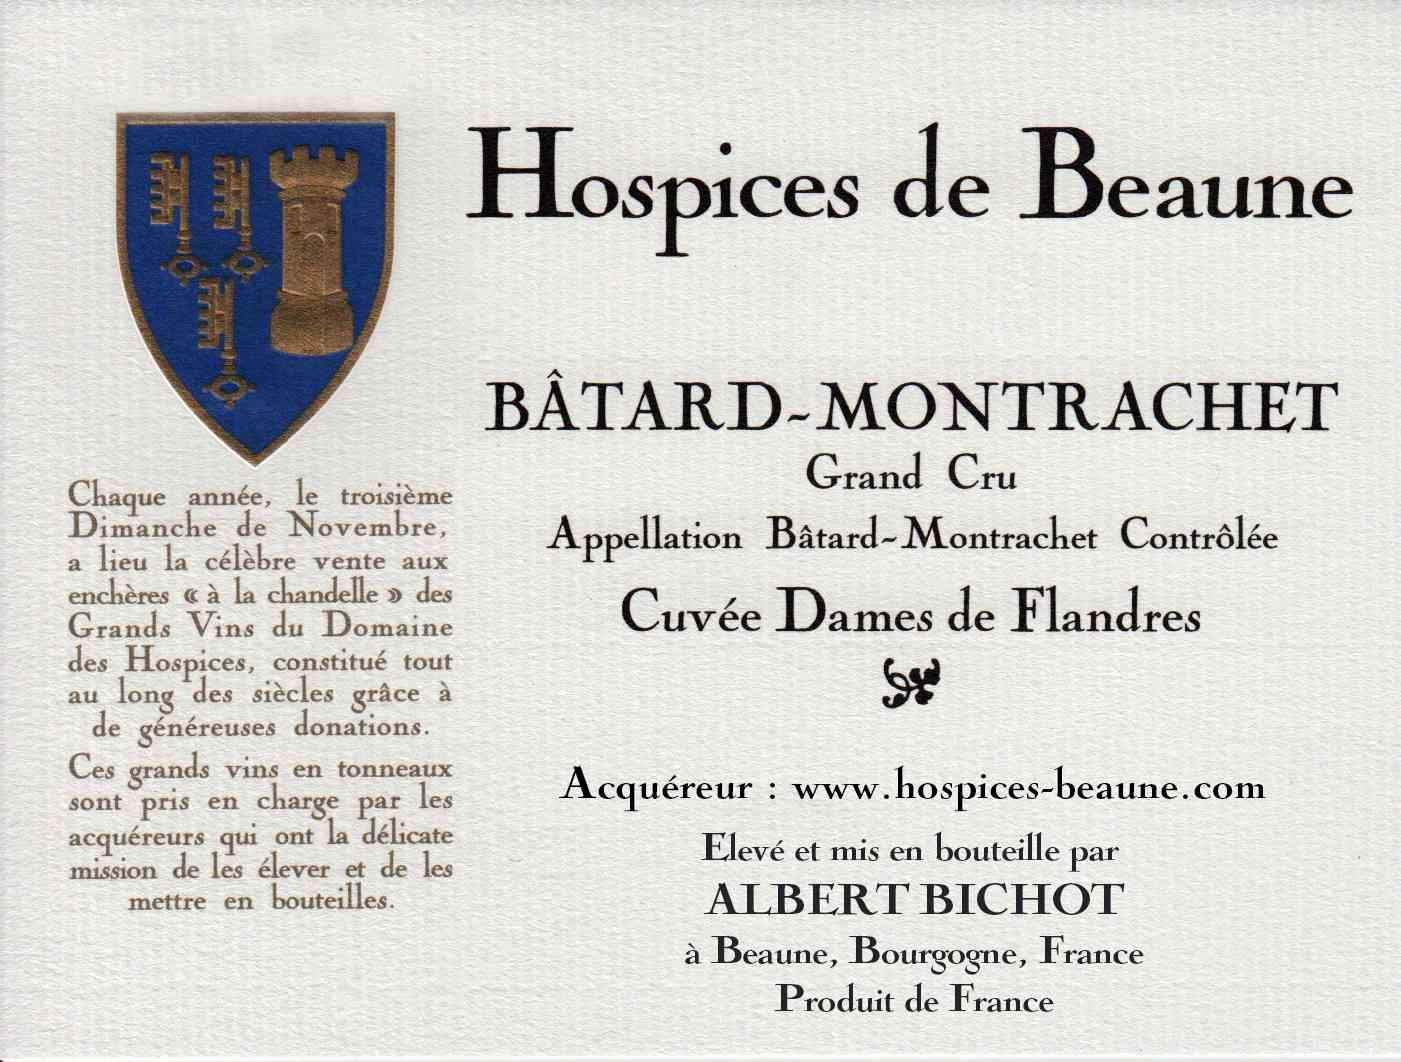 Encheres-auction-HospicesdeBeaune-AlbertBichot-BatardMontrachet-GrandCru-Cuvee-DamesdeFlandres